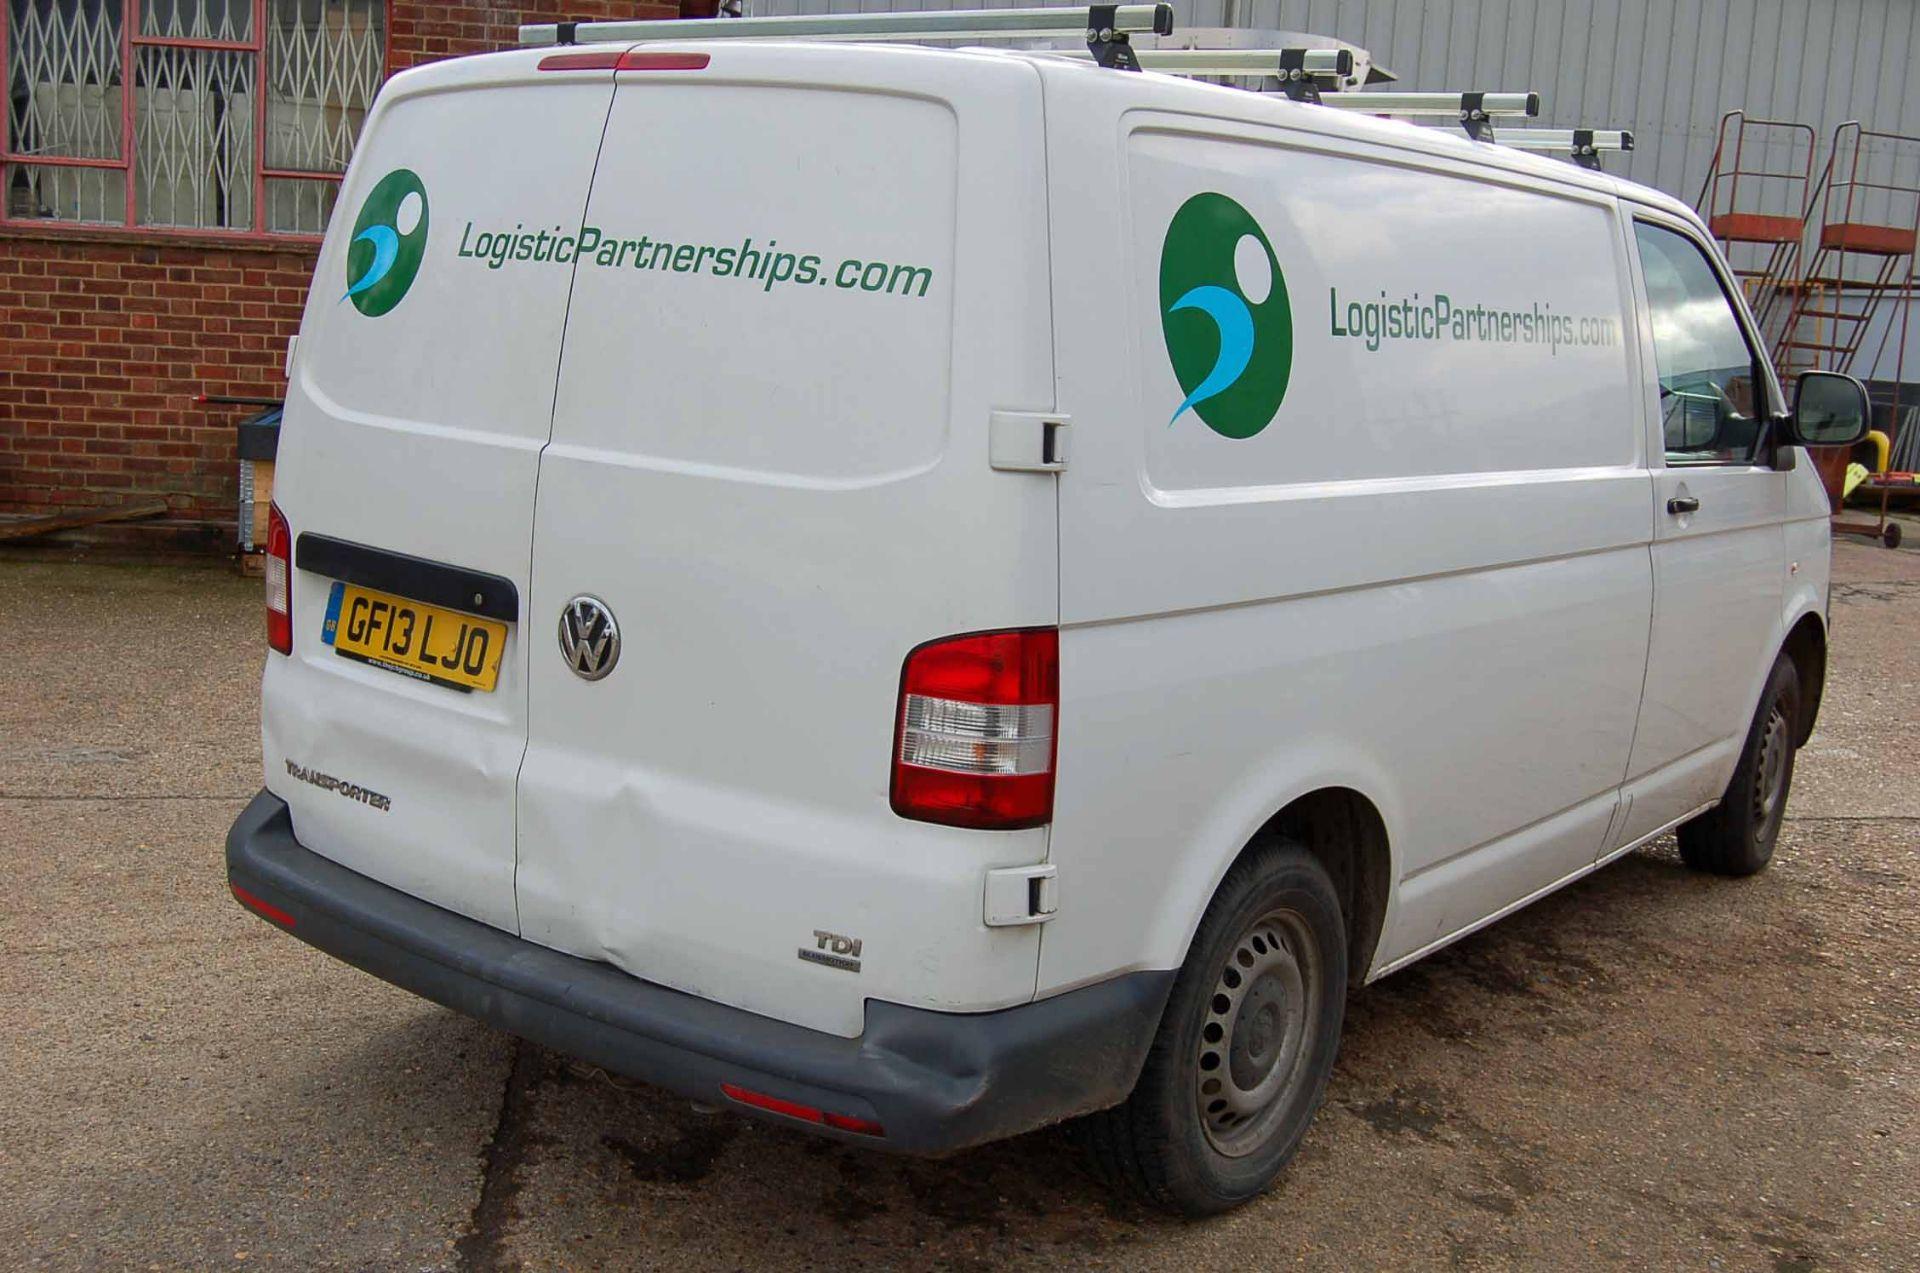 Lot 2 - A VOLKSWAGEN Transporter T28 2.0 TDi Bluemotion, Diesel, SWB Panel Van, Registration No. GF13 LJO,